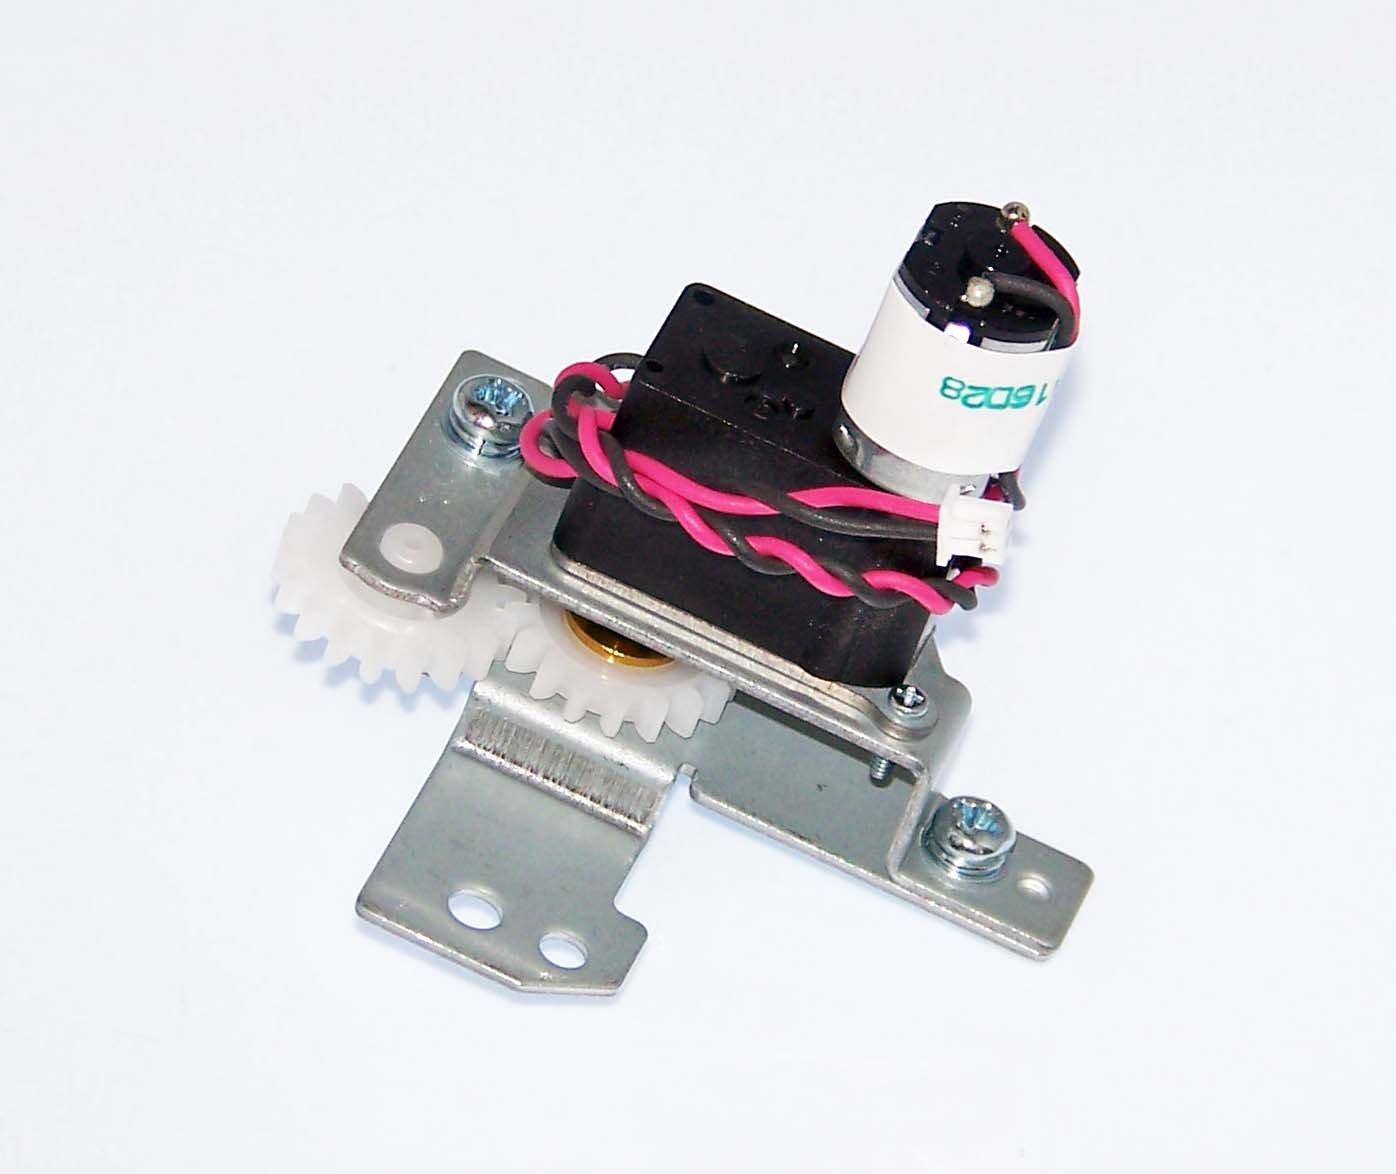 Epson OEM Projector CF Motor Assembly Originally Shipped With PowerLite Home Cinema 6100, 6500 UB, 720, 8100, 8350, 8500 UB, 8700 UB